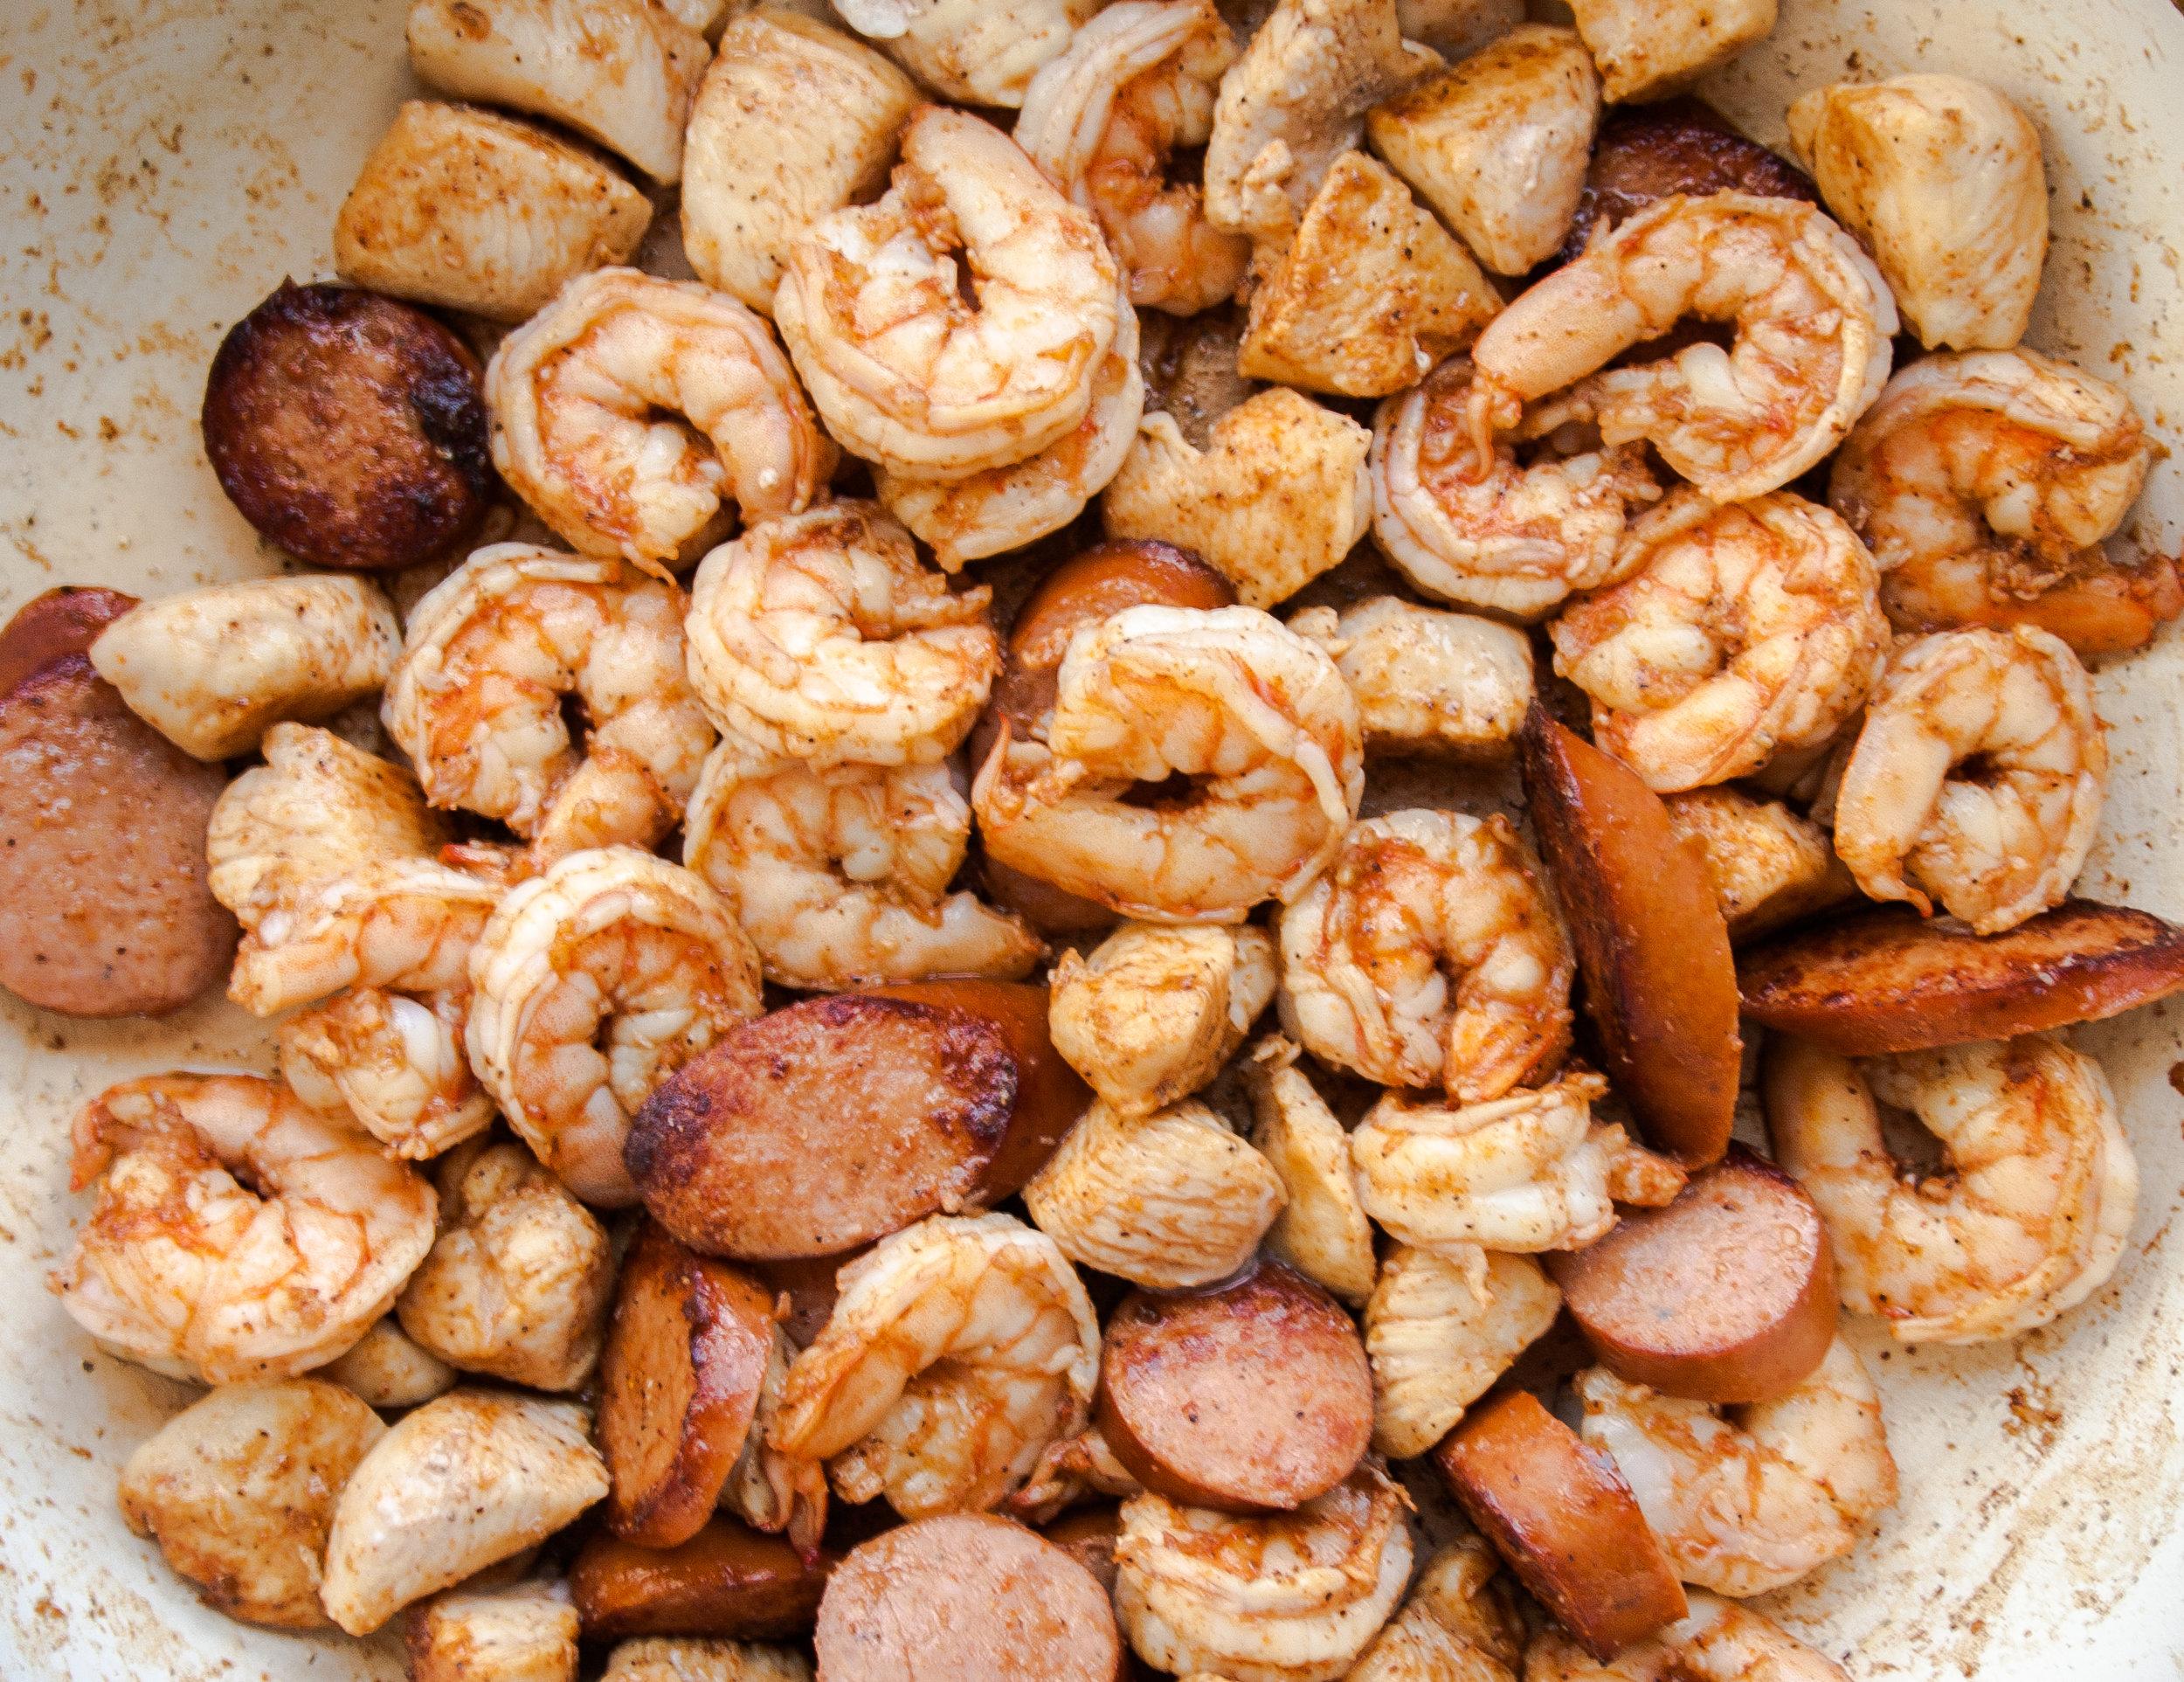 Jambalaya with Chicken, Shrimp and Andouille Sausage